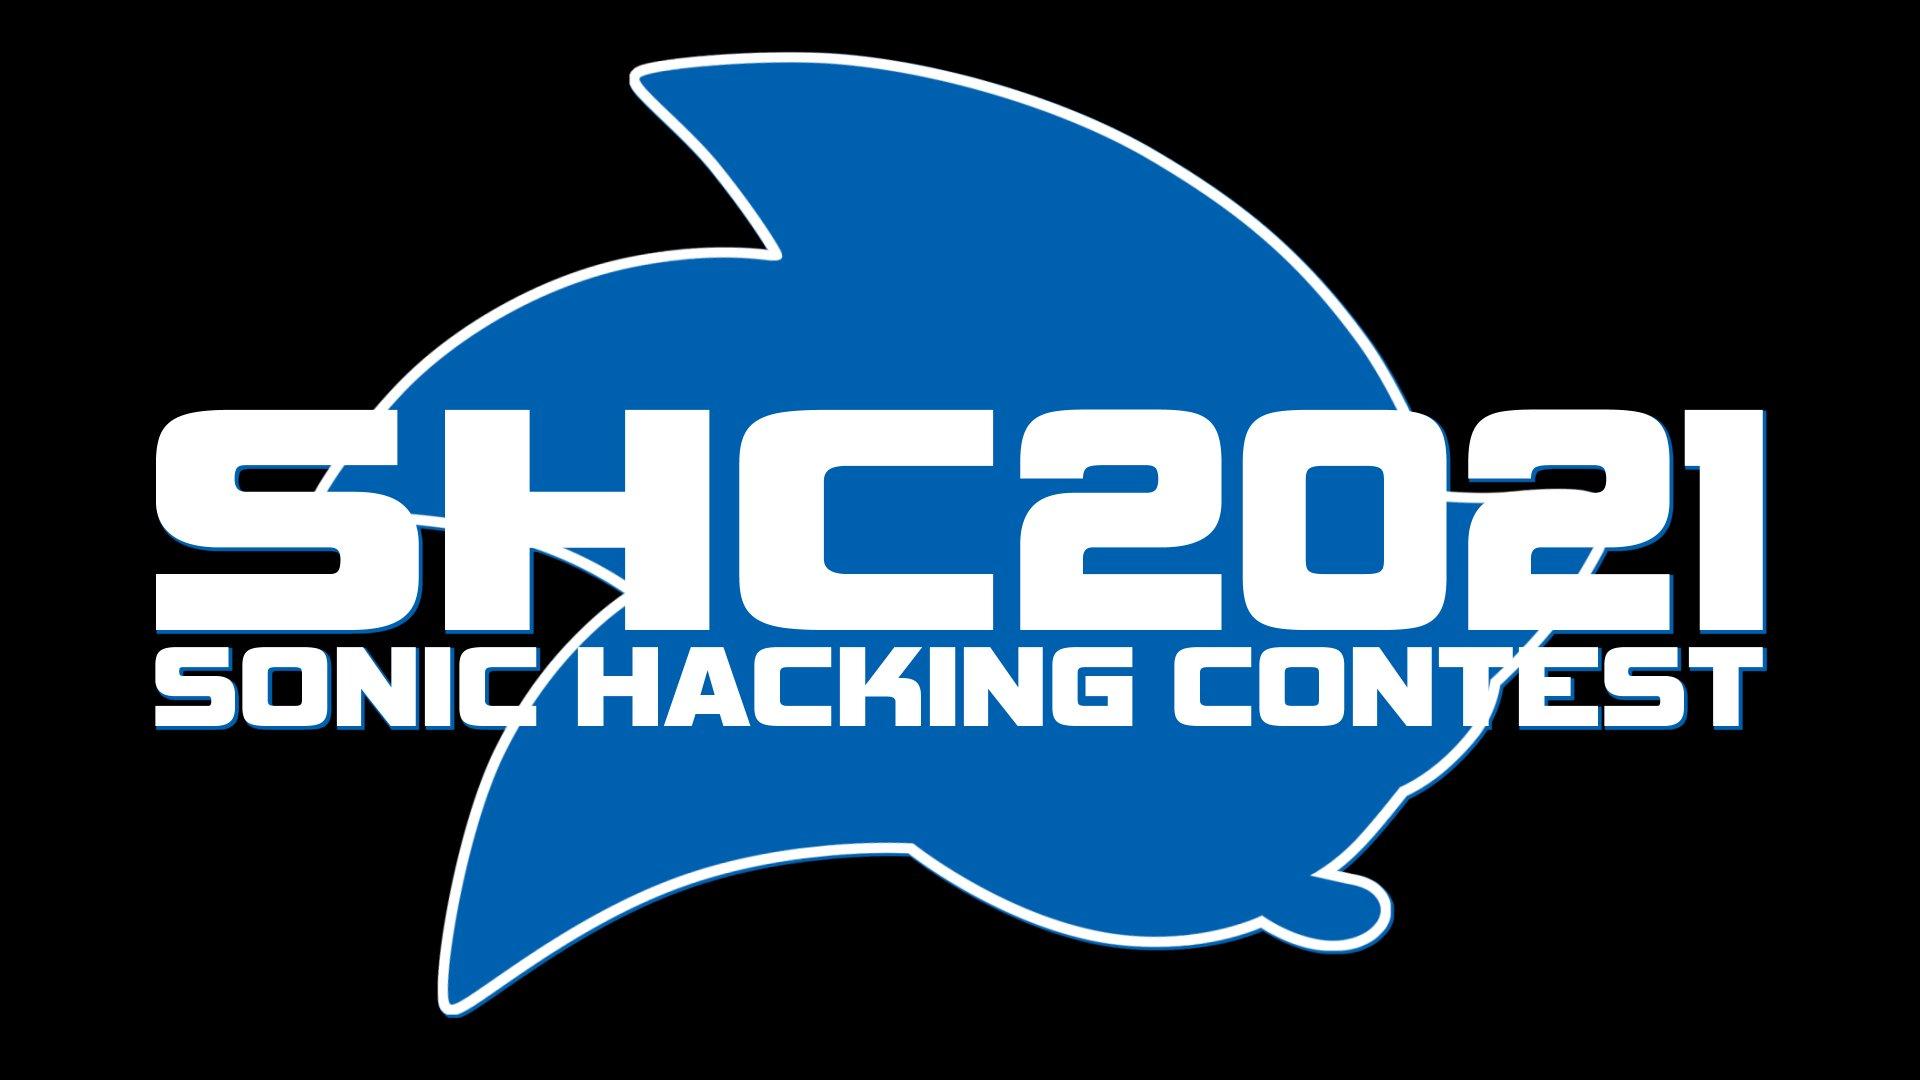 Sonic Hacking Contest 2021 zapowiedziane!